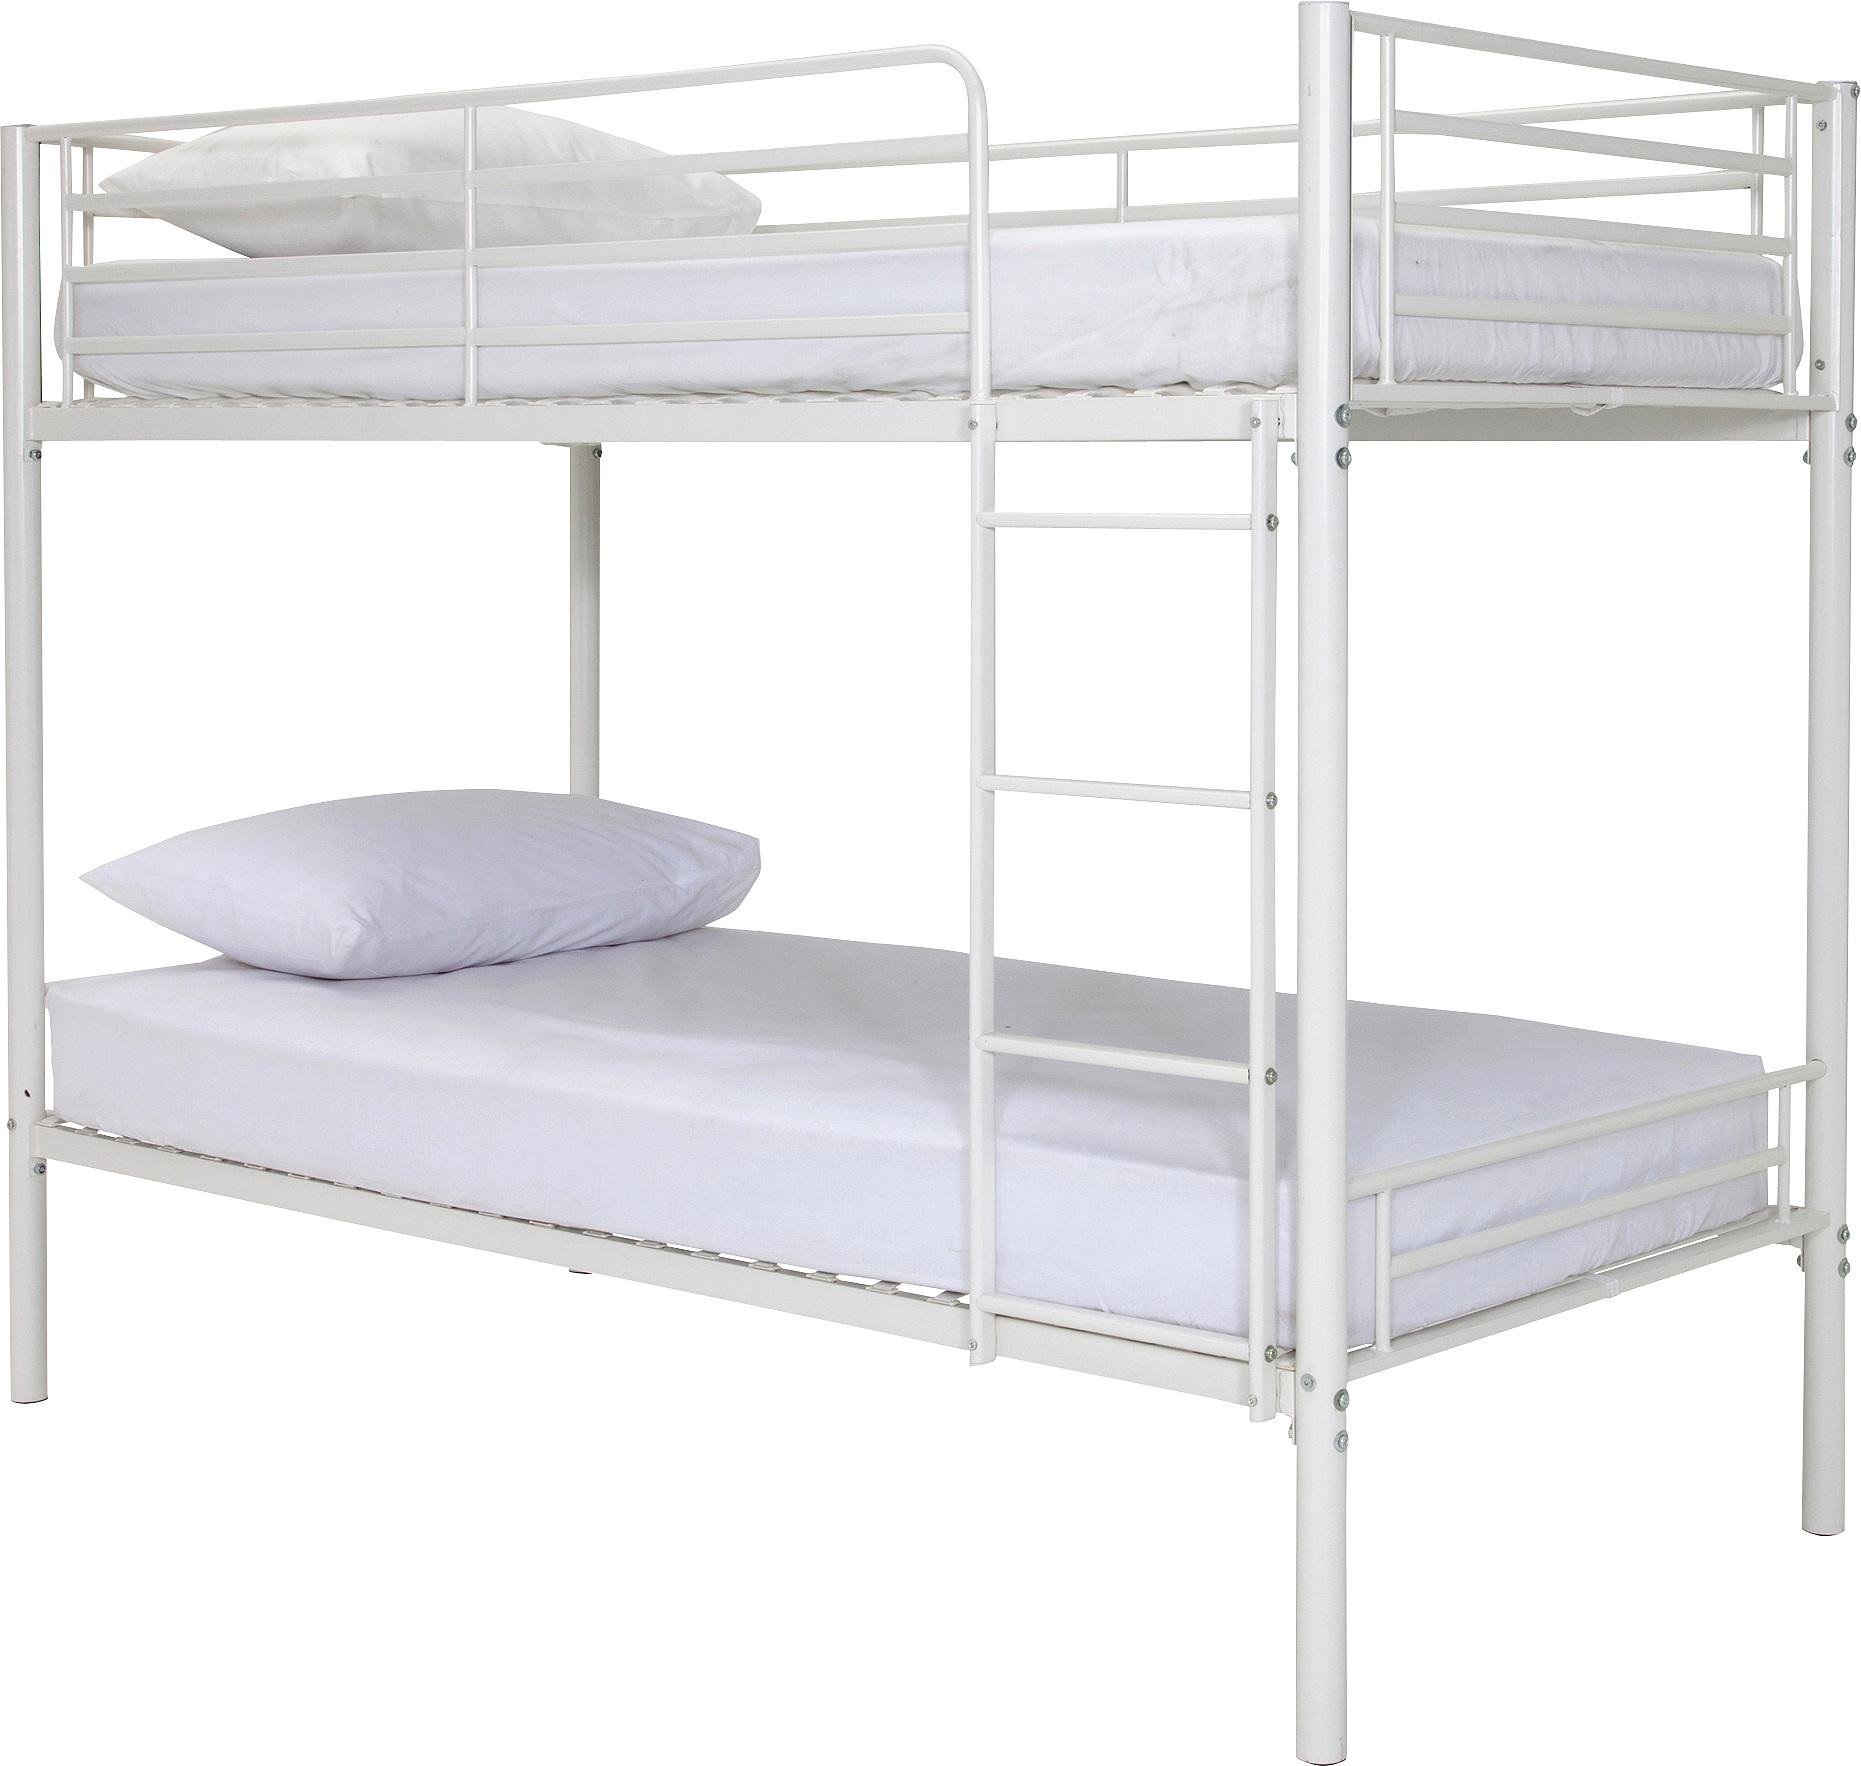 shorty bunk beds latitudebrowser